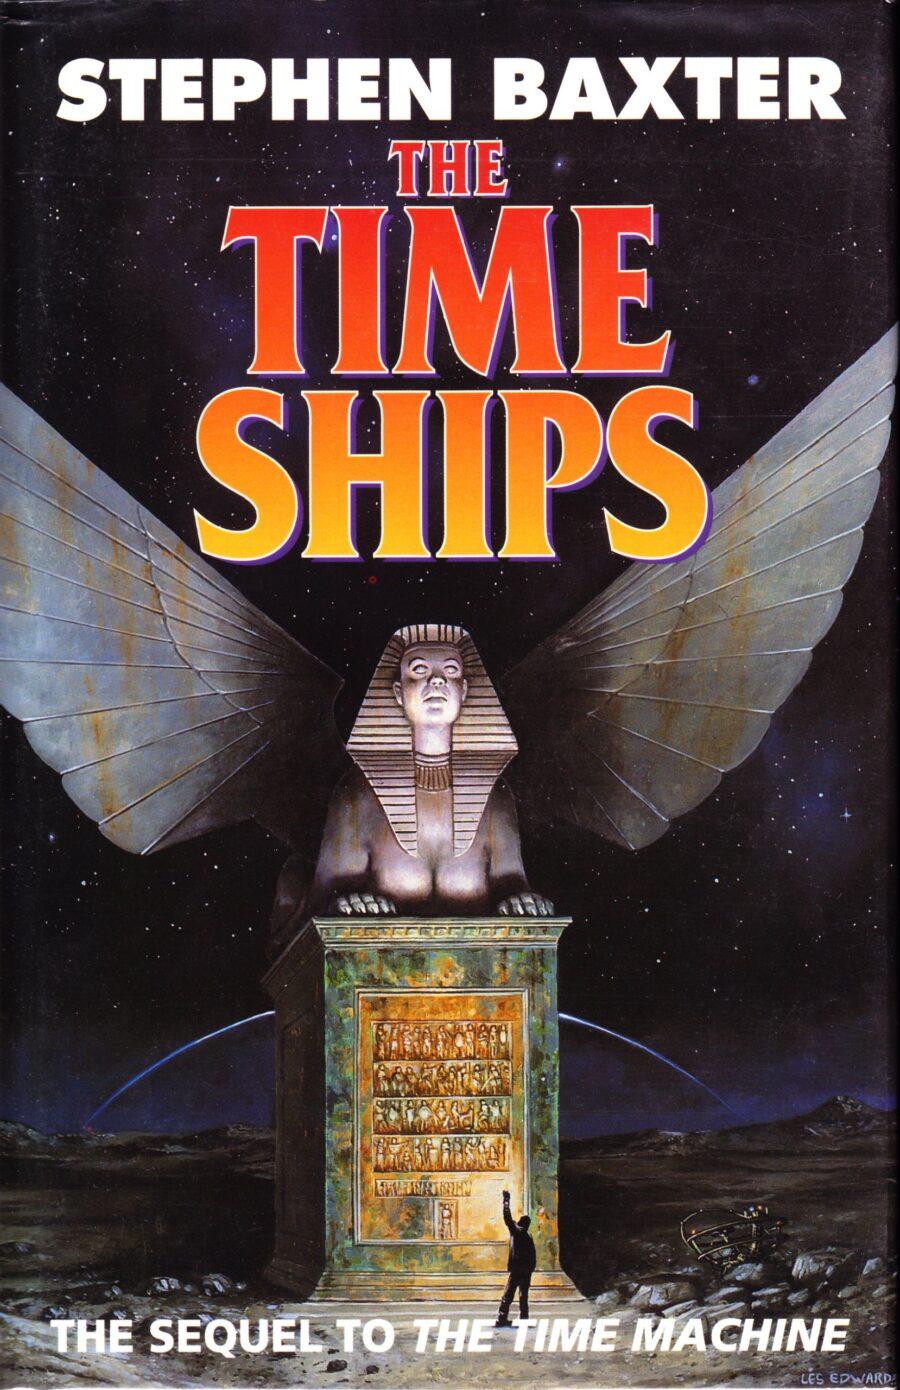 Sci-Fi sequel to Time Machine